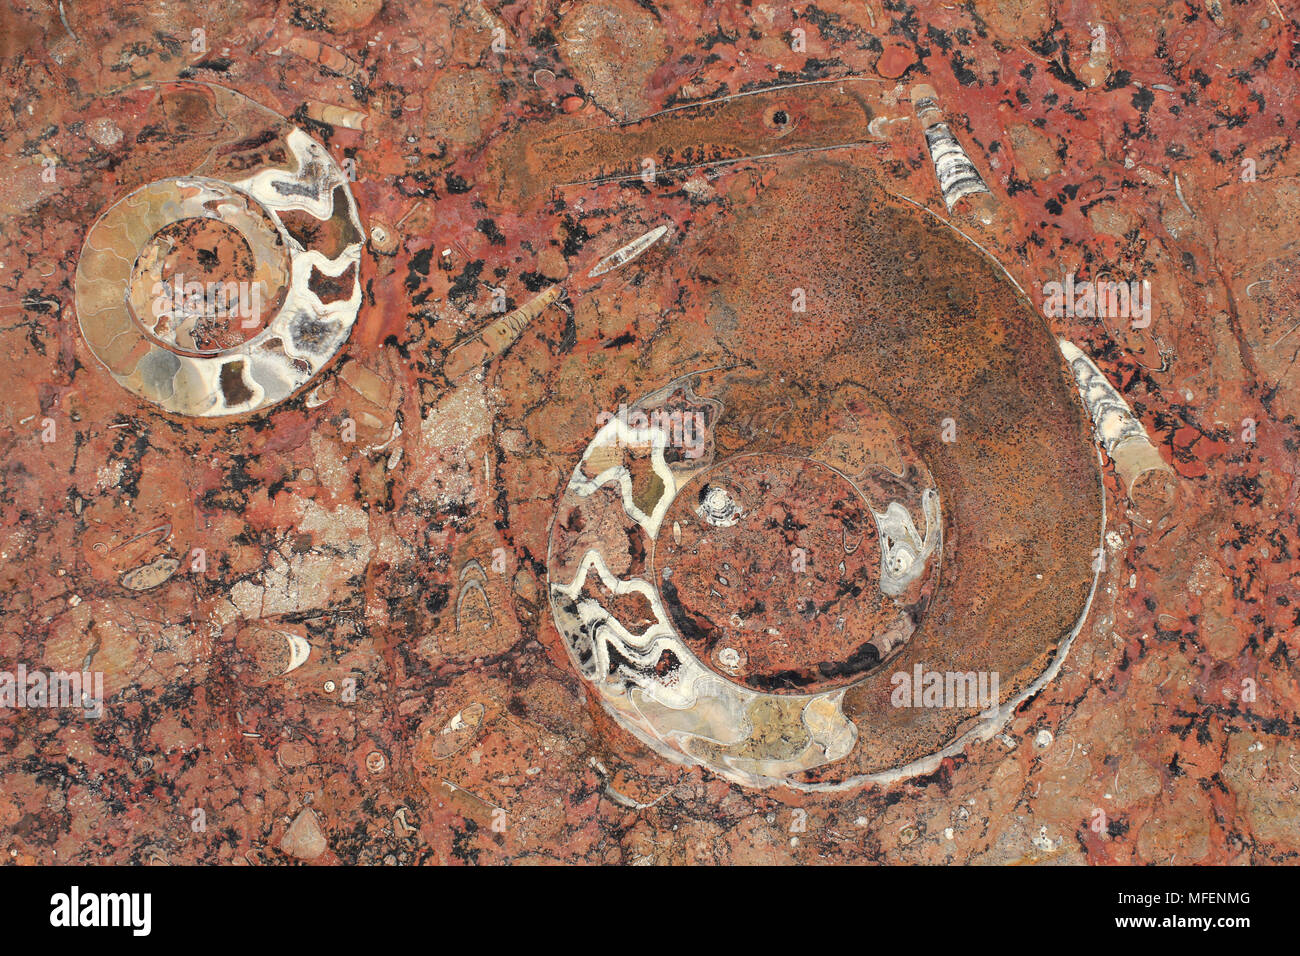 Ammonite (Goniatite) Fossils, Morocco - Stock Image